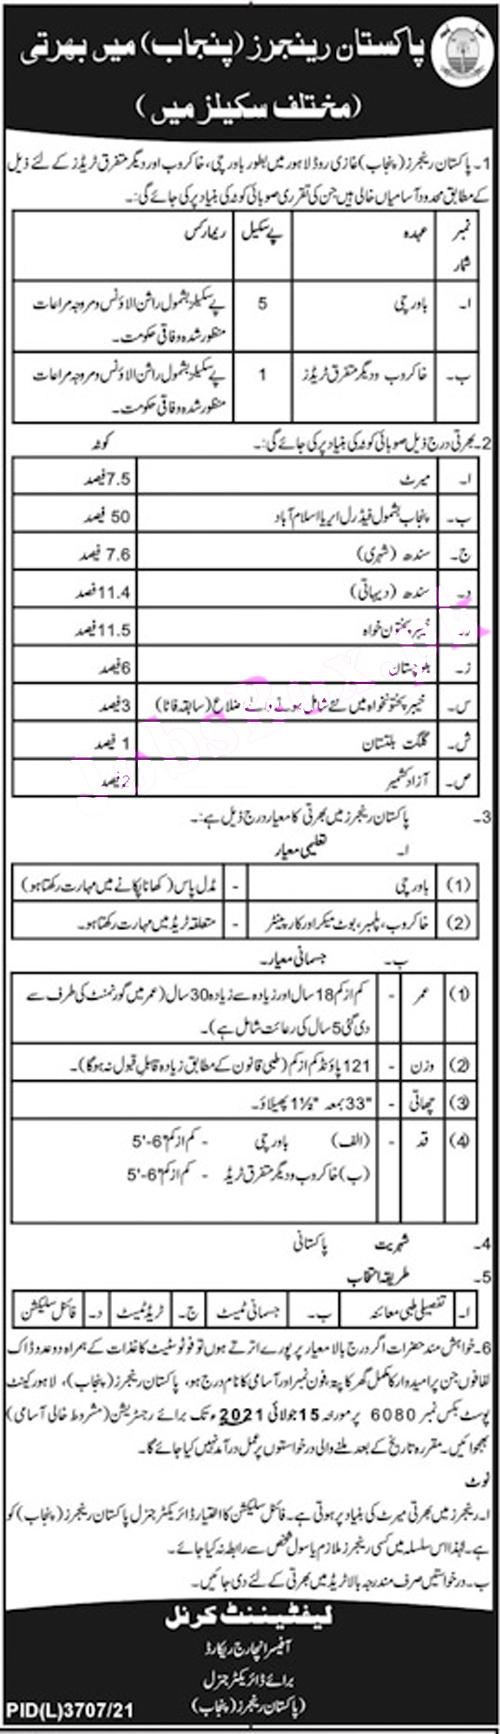 Pakistan Rangers Civilian Jobs 2021